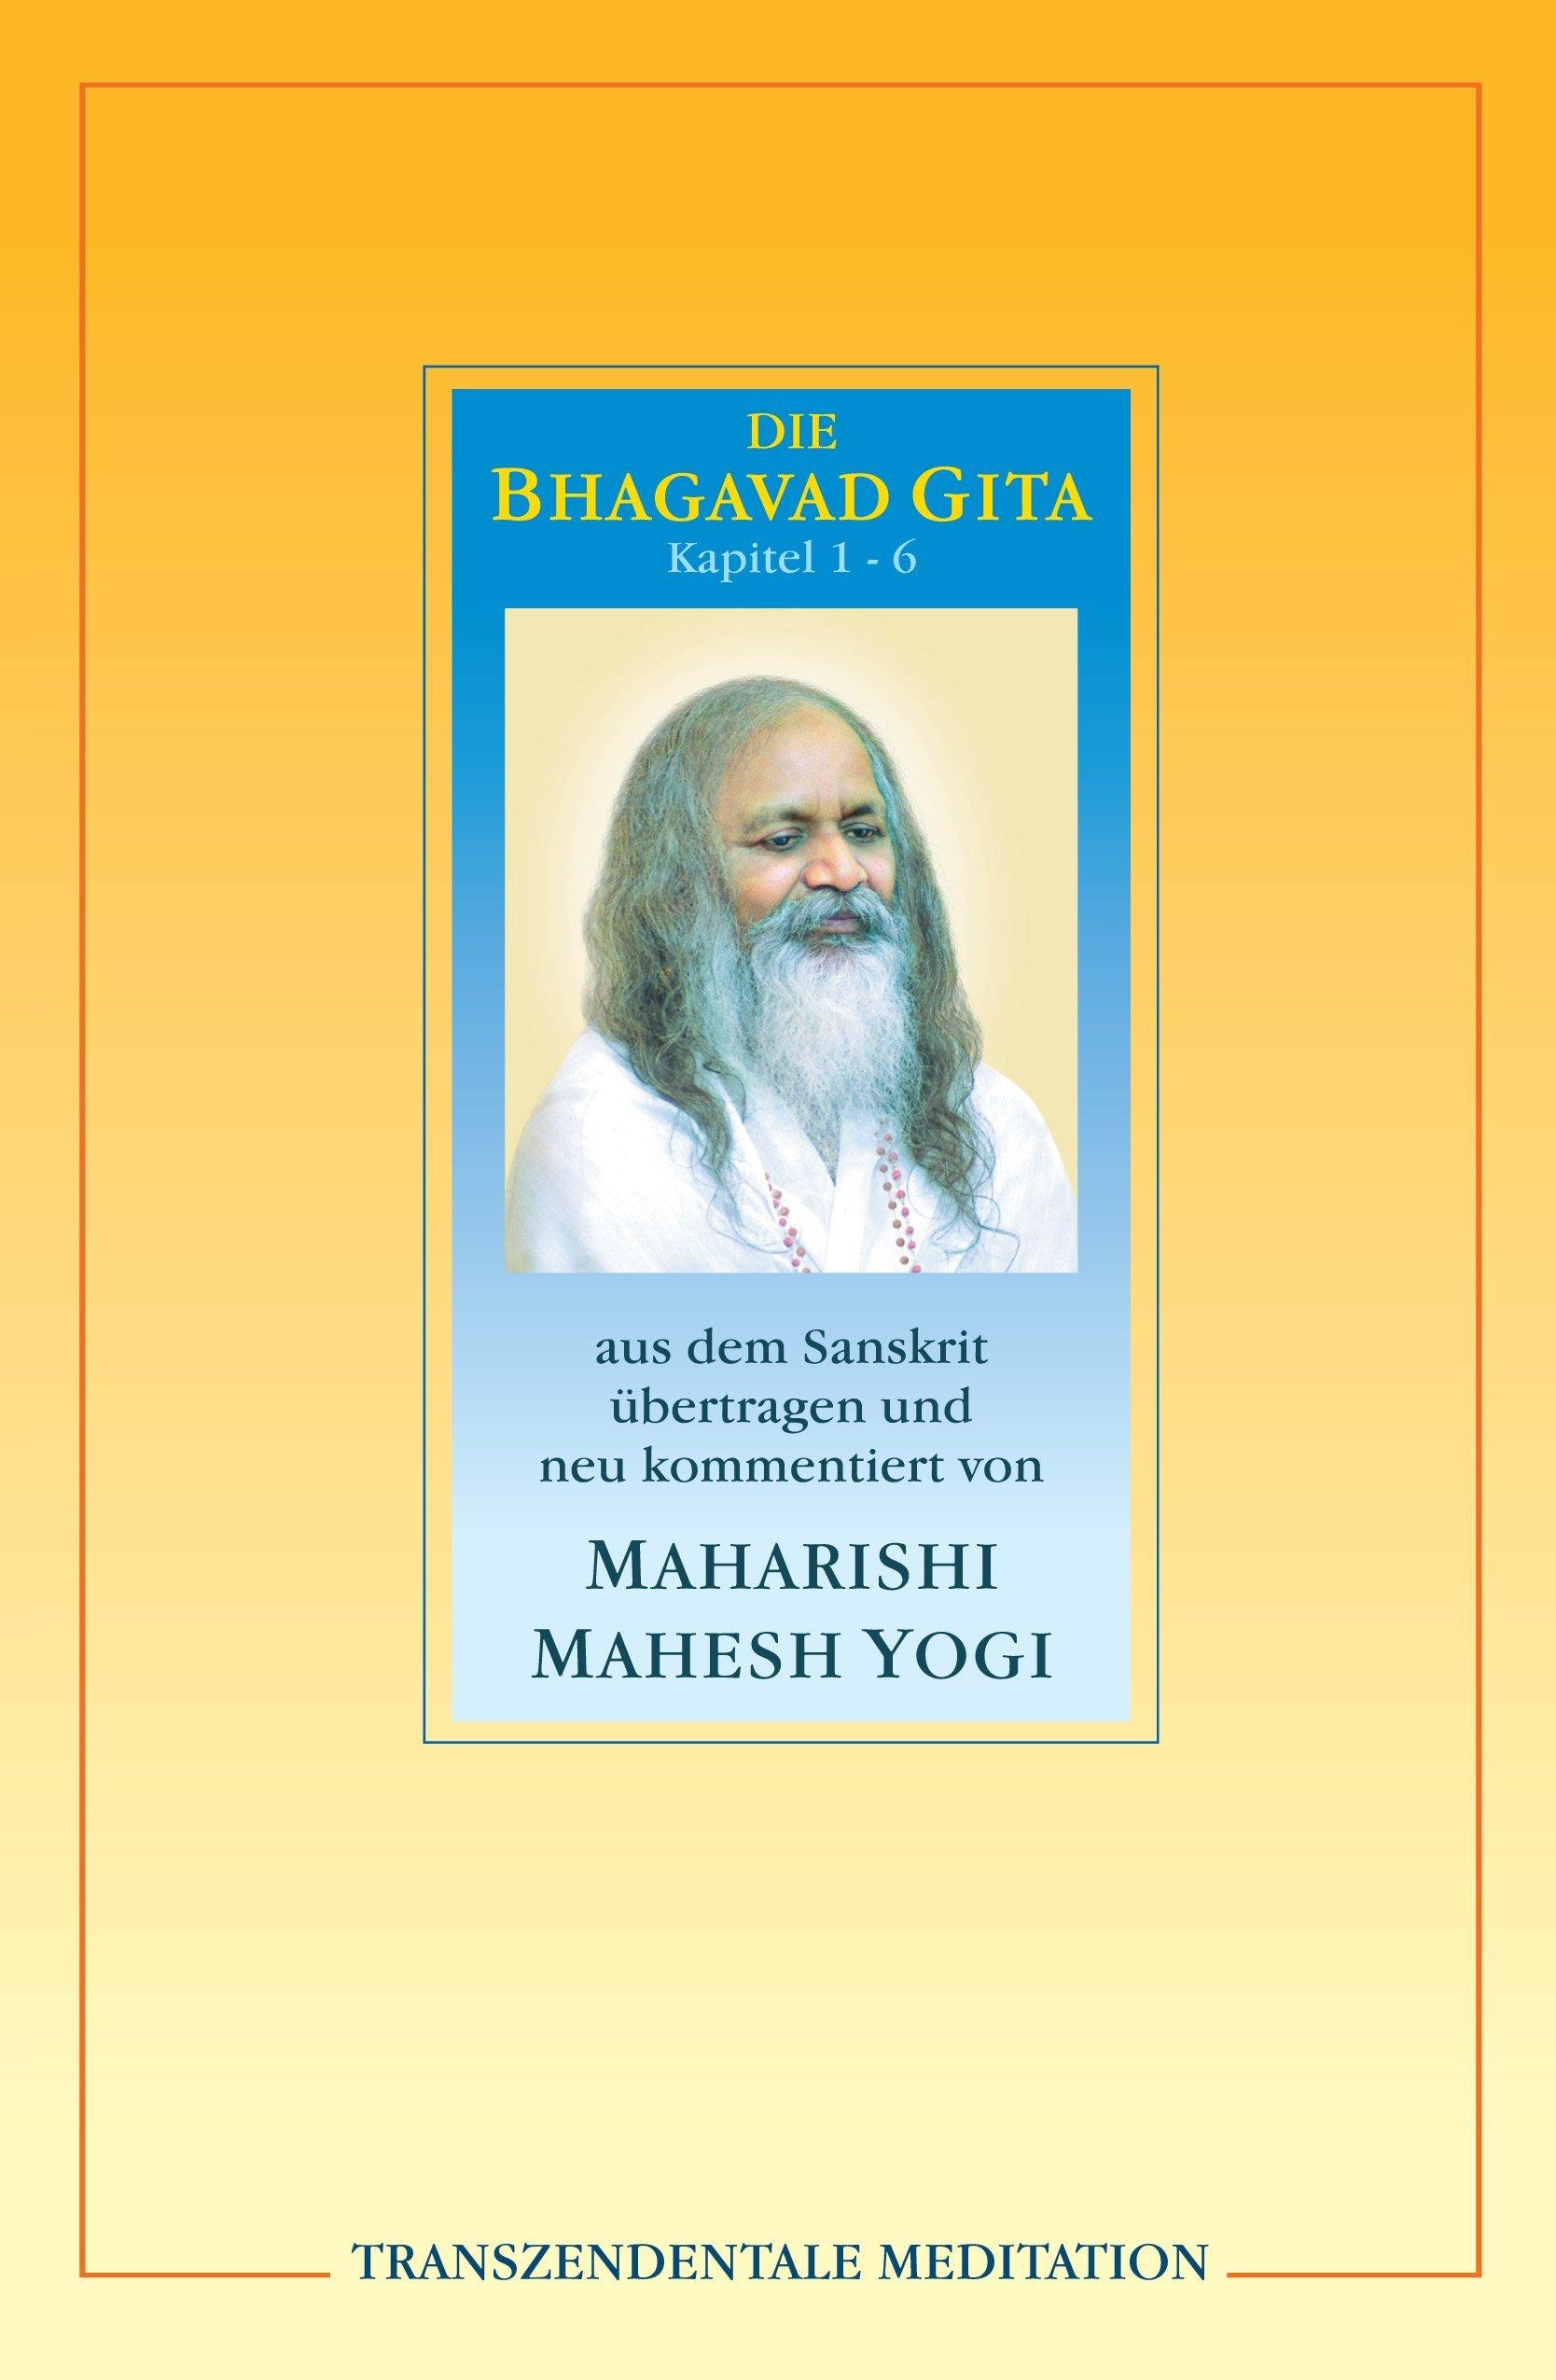 Bhagavad Gita. Kapitel 1 - 6. Taschenbuch – 1. April 1999 Maharishi Mahesh Yogi J. Kamphausen Verlag 3933496411 Autogenes Training